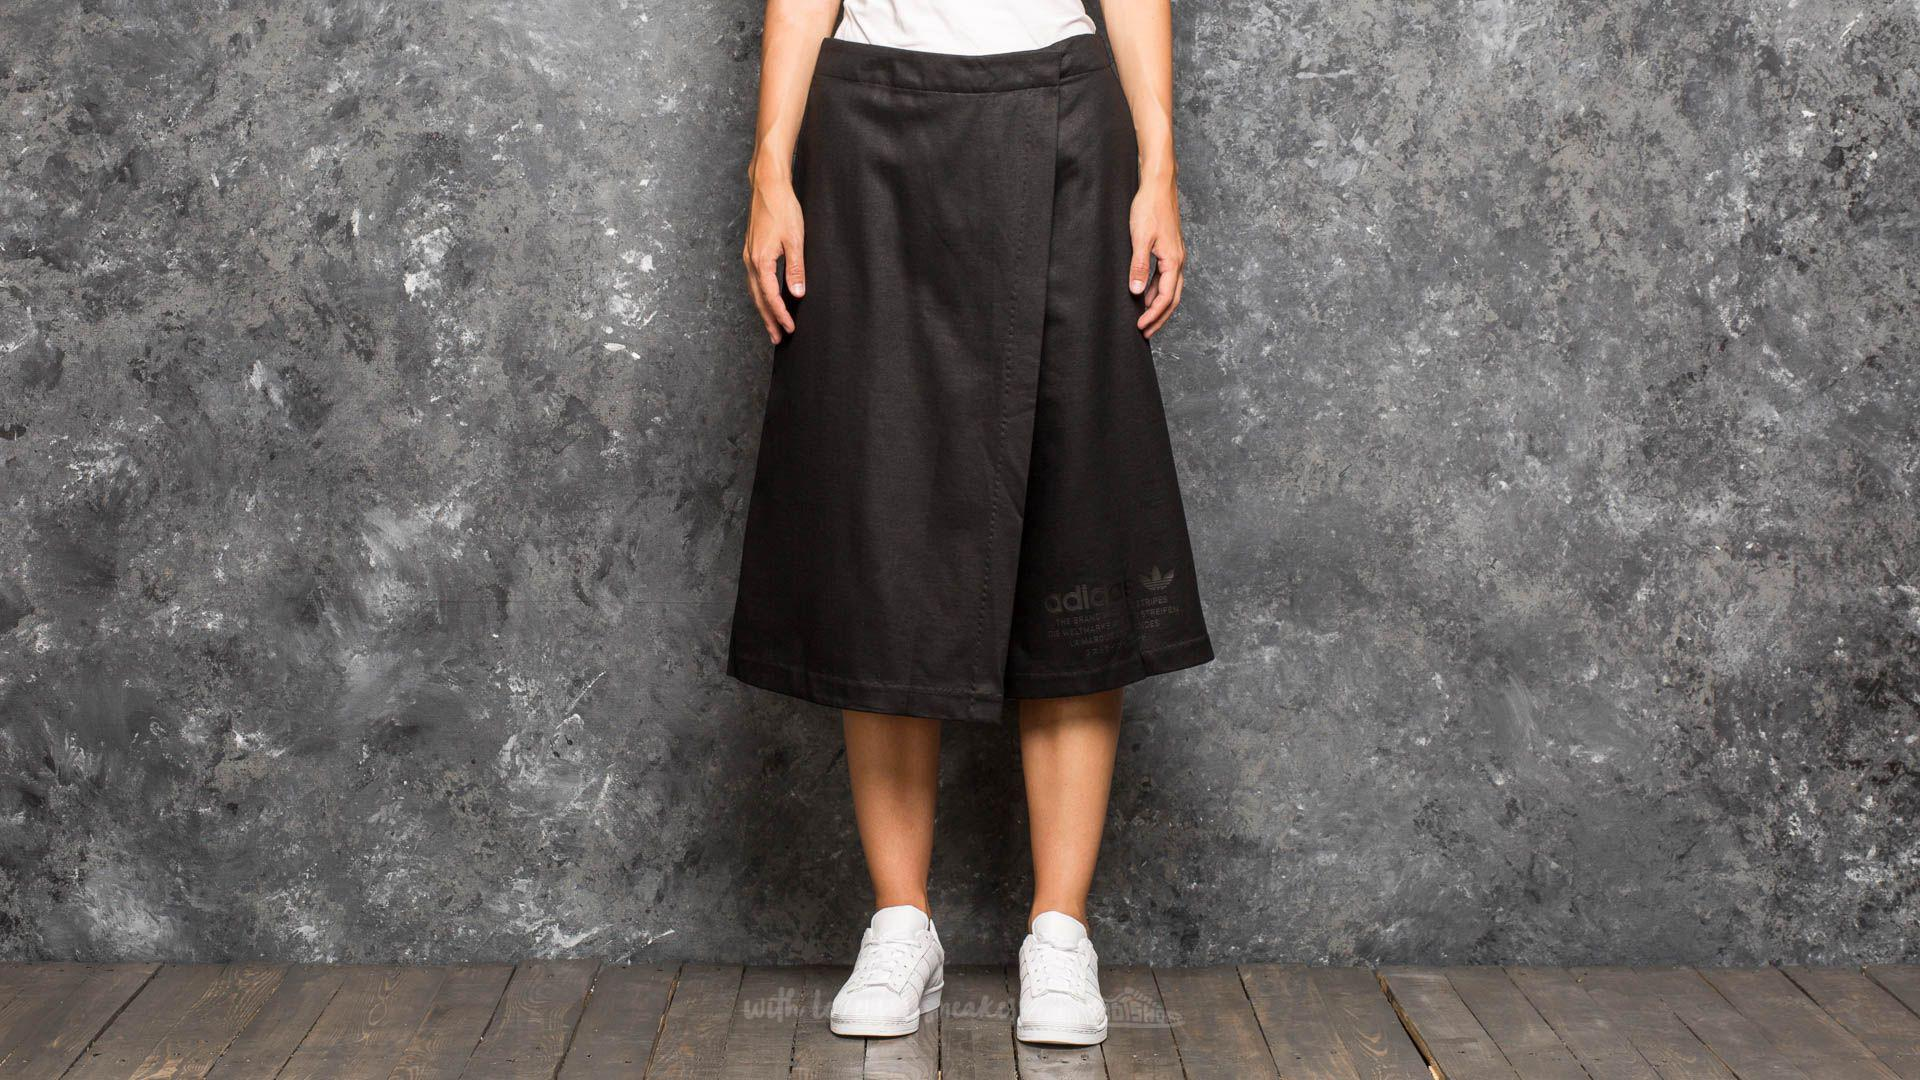 Lyst adidas Originals Adidas culotte pantalon negro en negro